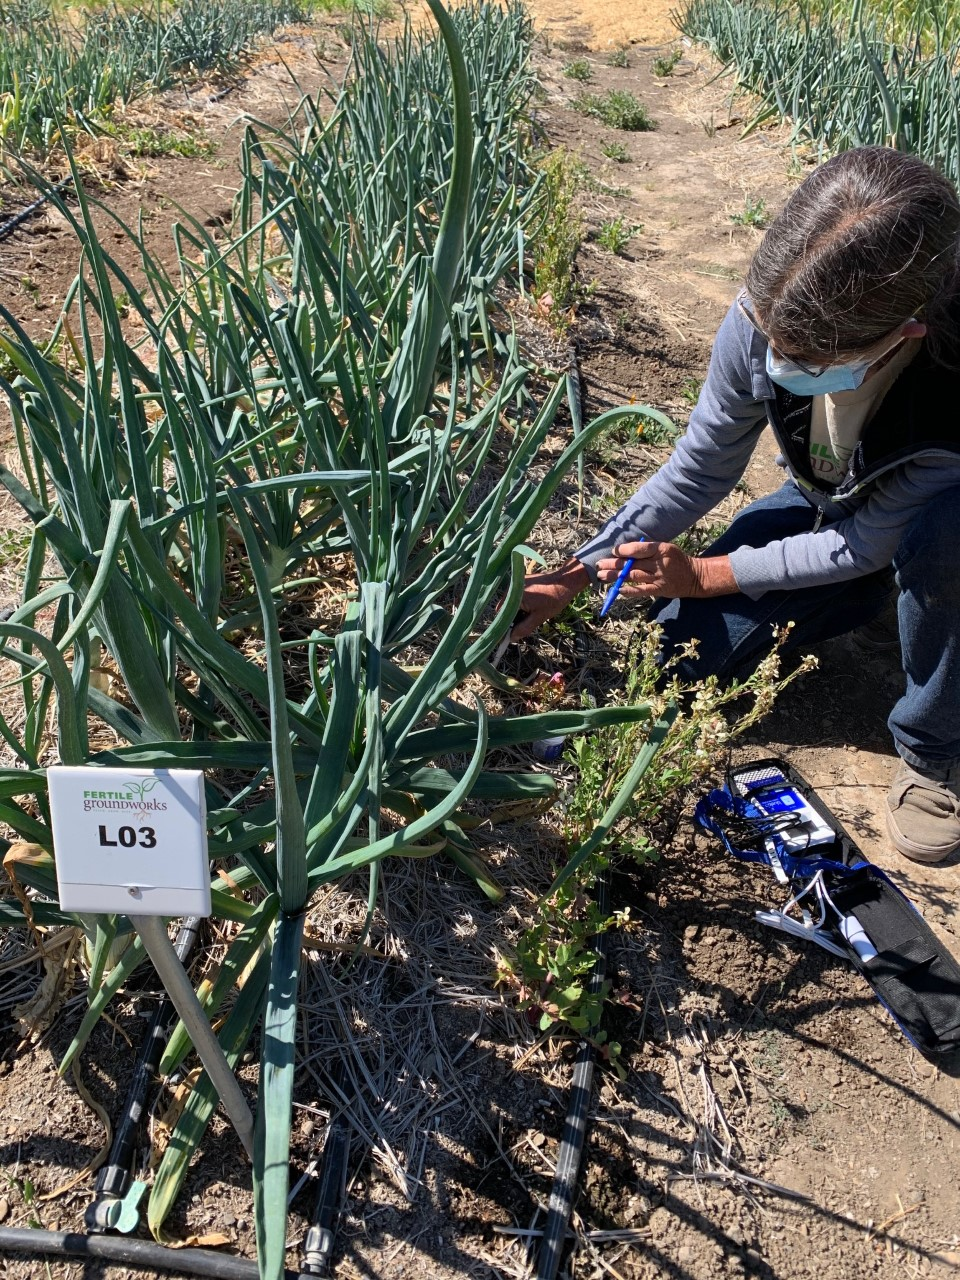 Harvesting in the Bluelab-sponsored plant bed at Fertile GroundWorks